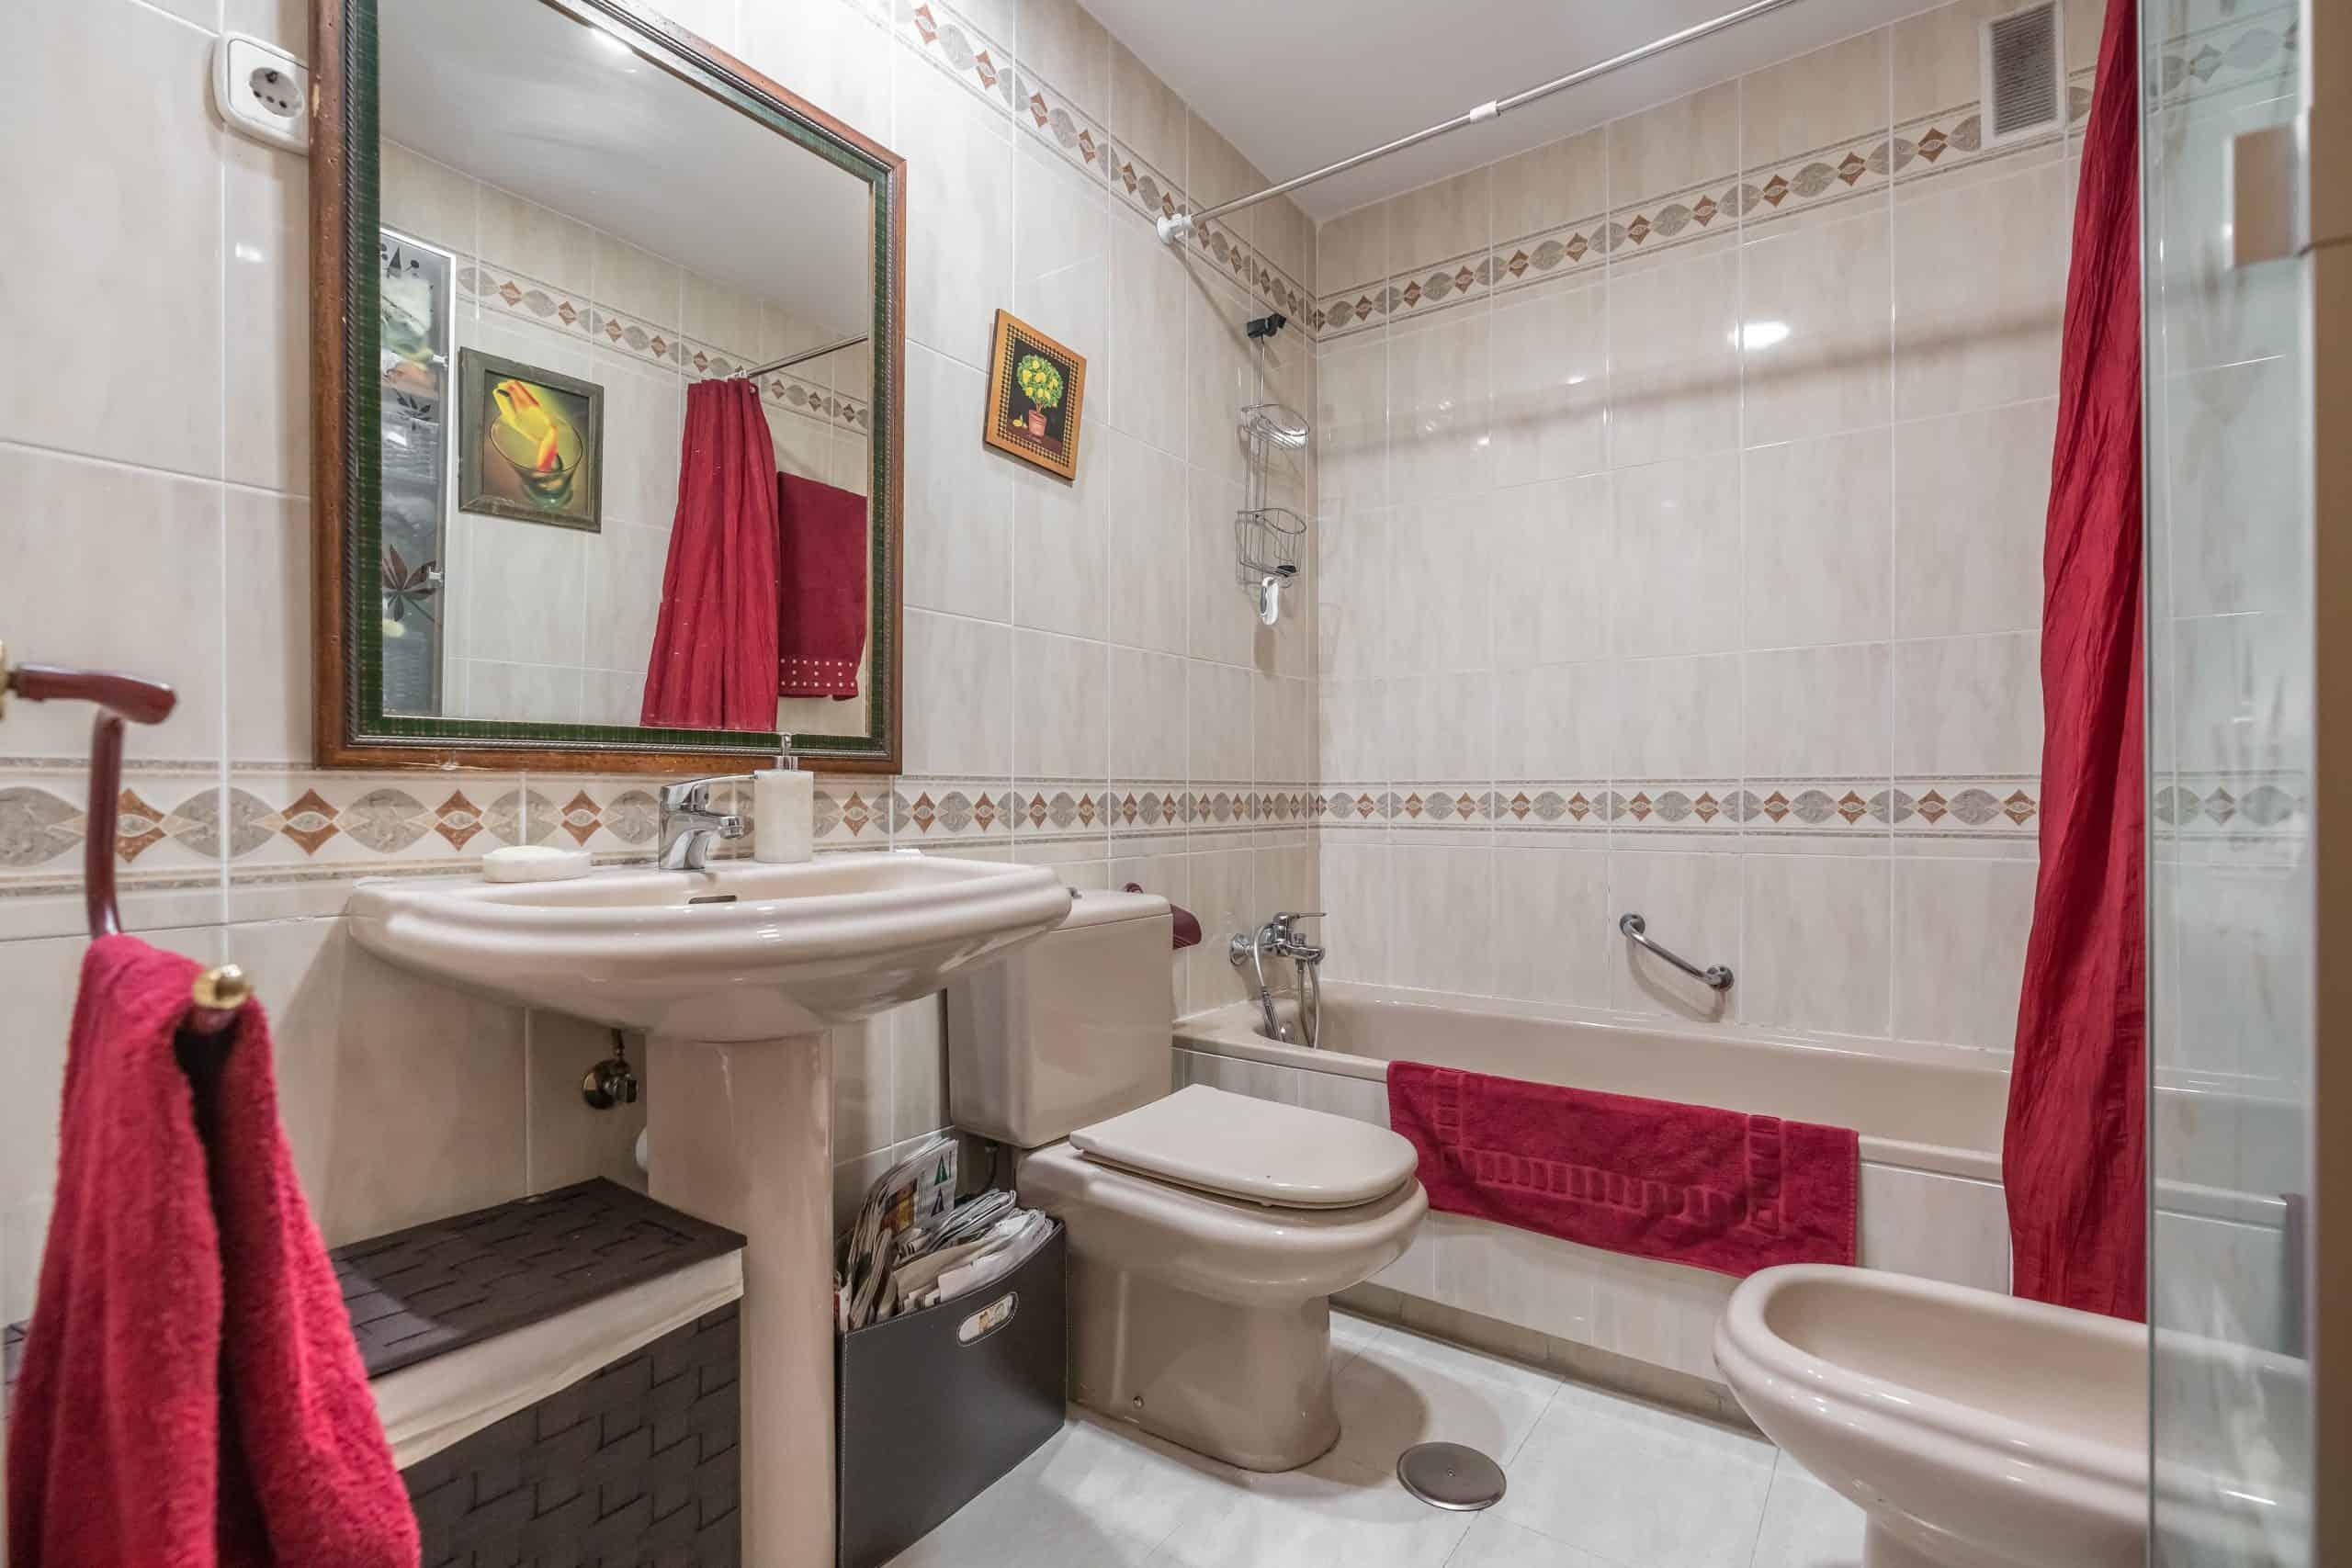 Agencia Inmobiliaria de Madrid-FUTUROCASA-Zona ARGANZUELA-EMBAJADORES-LEGAZPI3 BAÑO2 (1)